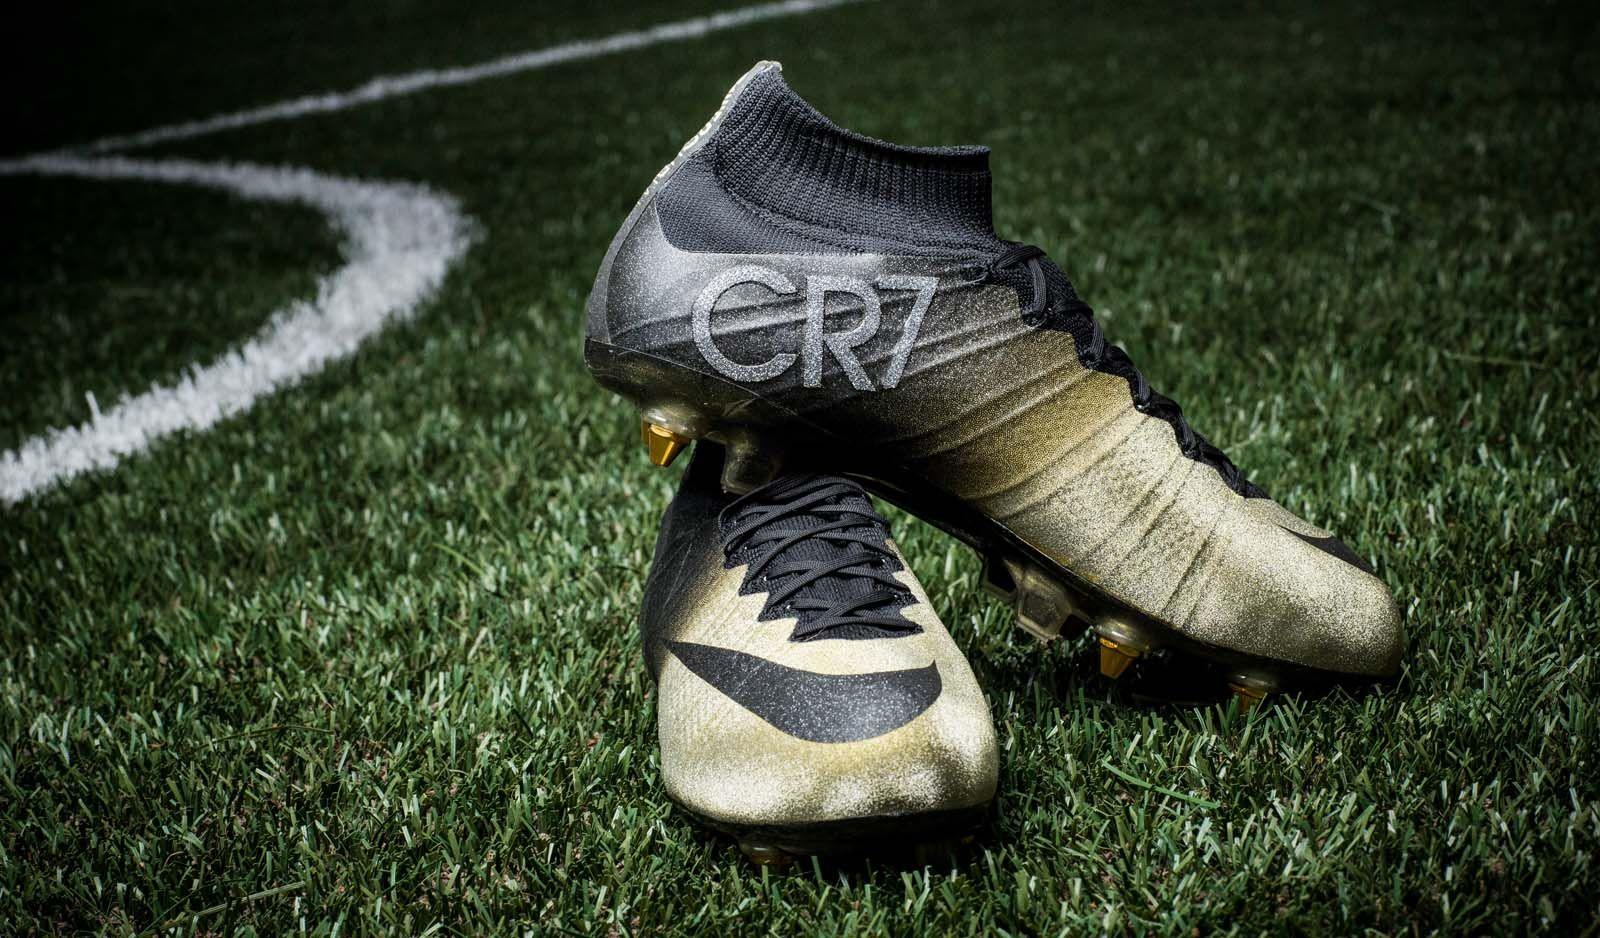 soccer cleats ronaldo - Google Search | Ronaldo Soccer Cleats | Pinterest |  Soccer cleats, Ronaldo soccer and Cleats